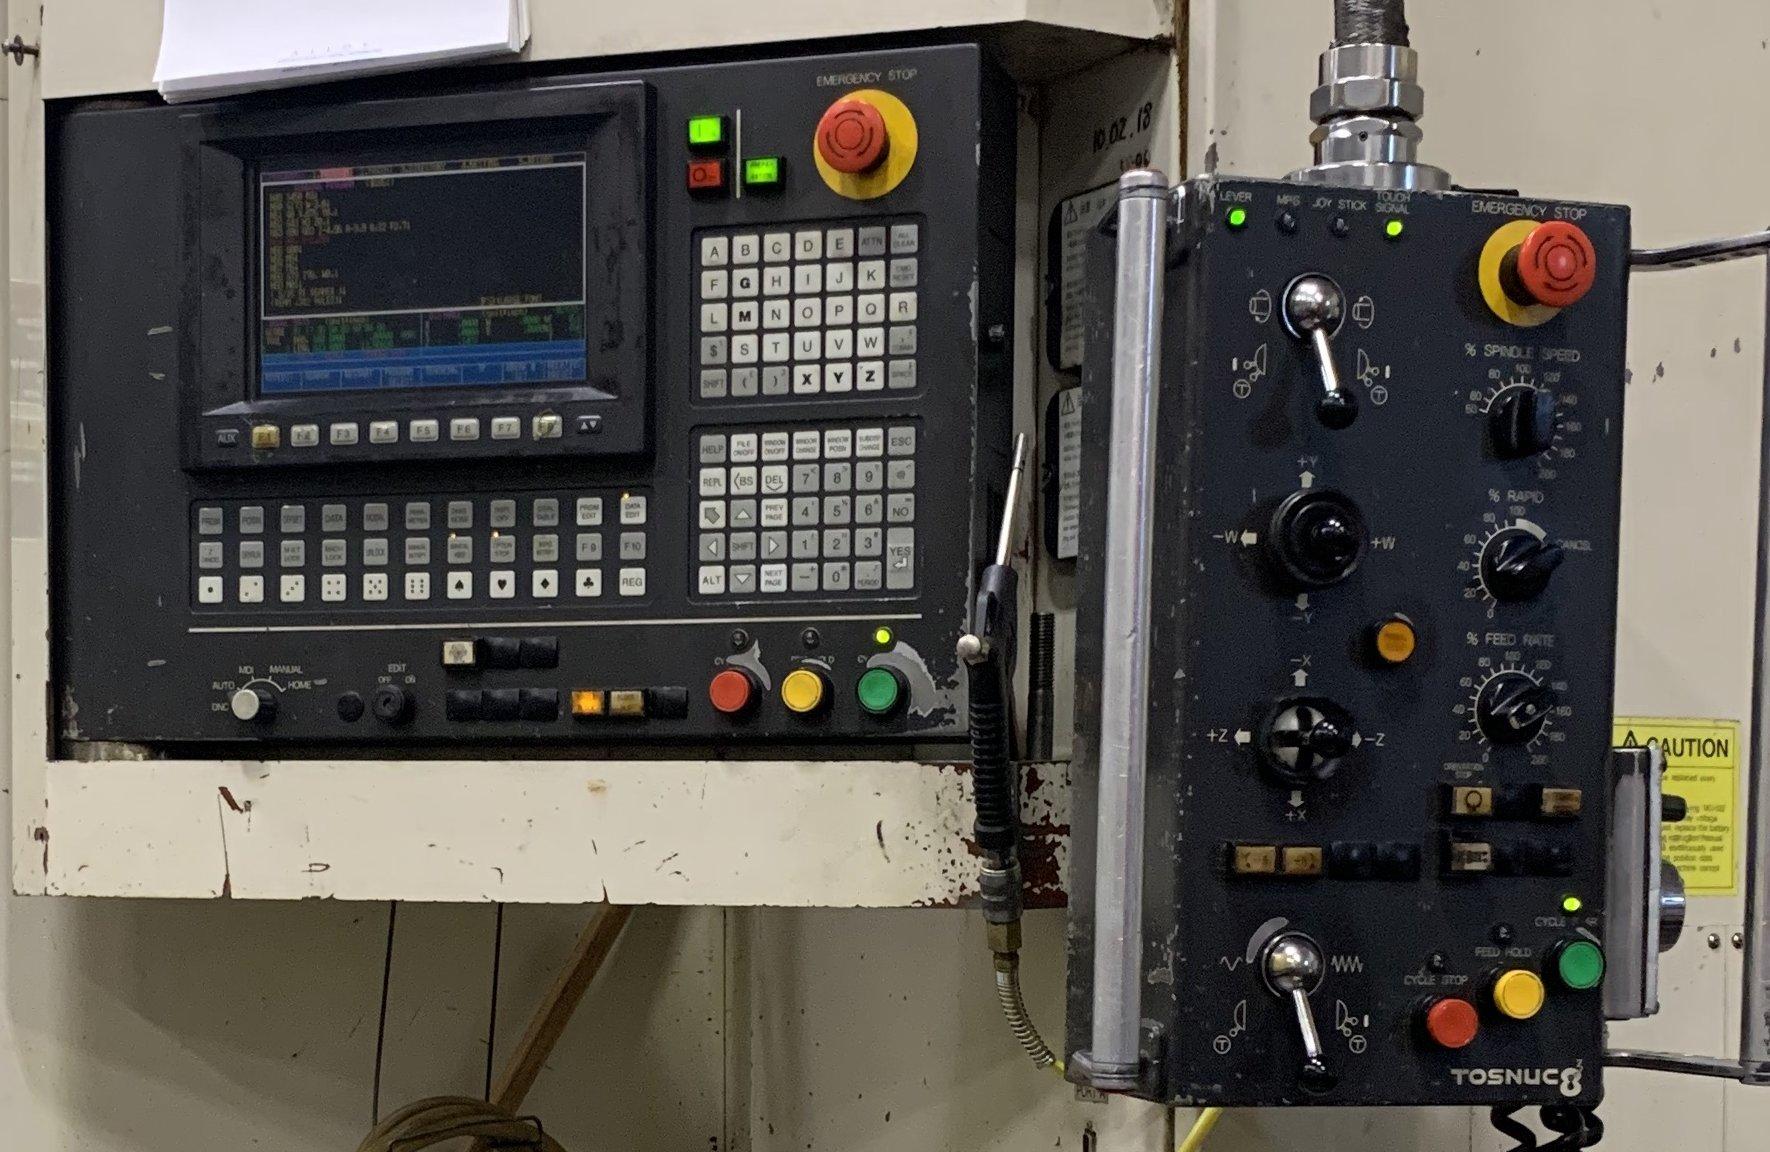 Toshiba BTD-110.R16 CNC Horizontal Boring Mill